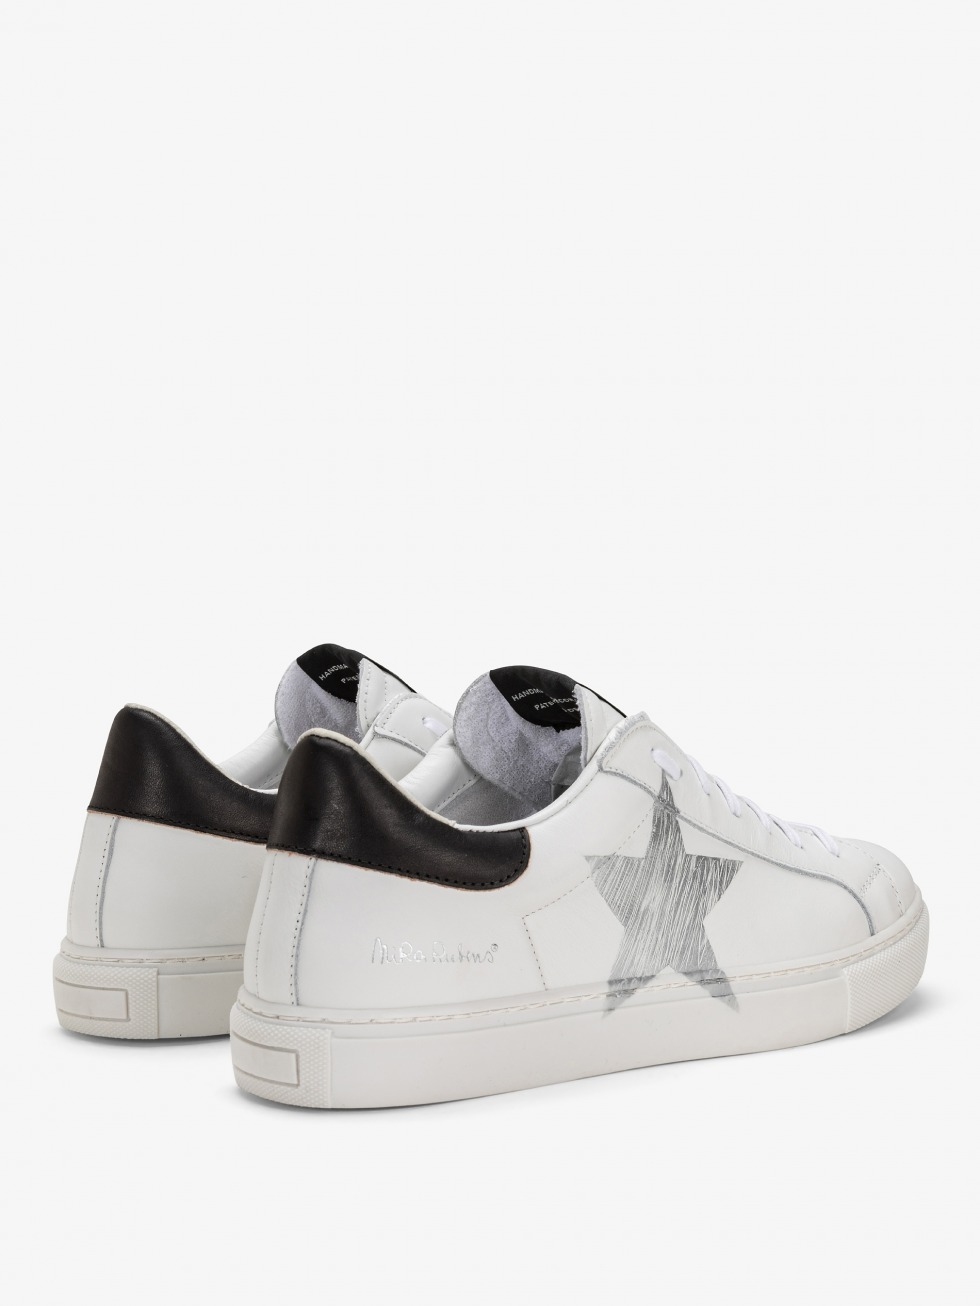 Martini M Sneakers - CIty Star